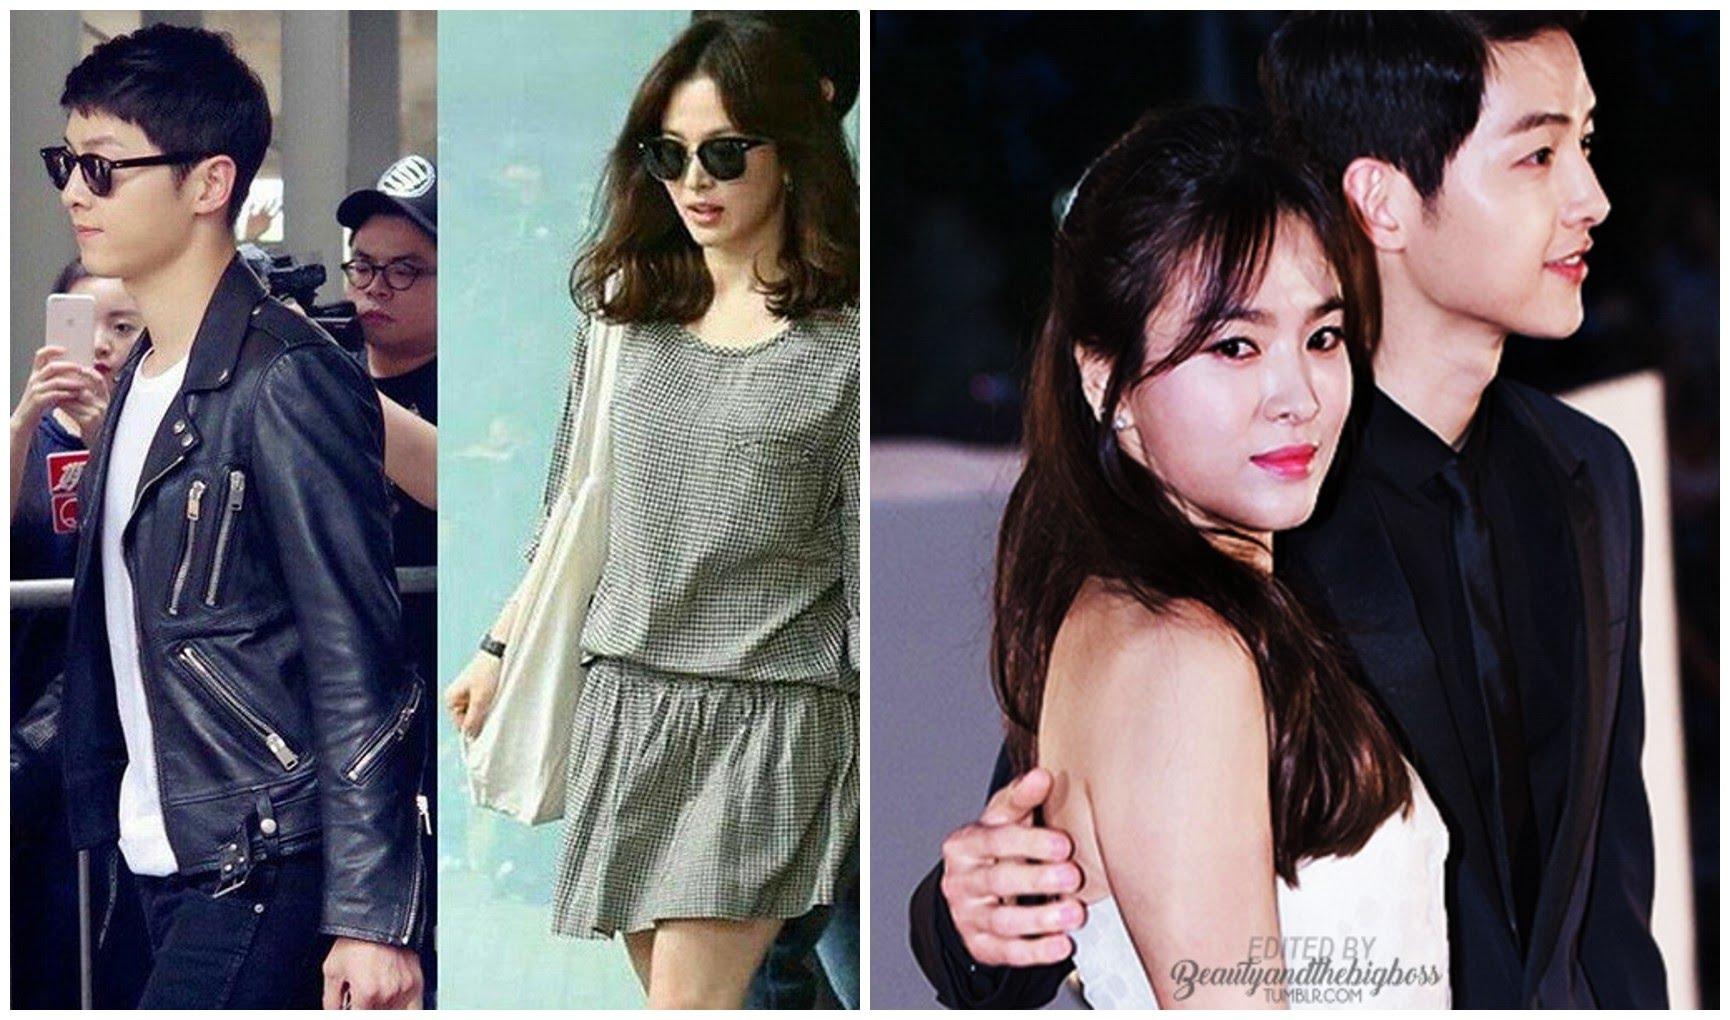 when did song joong ki start dating song hye kyo